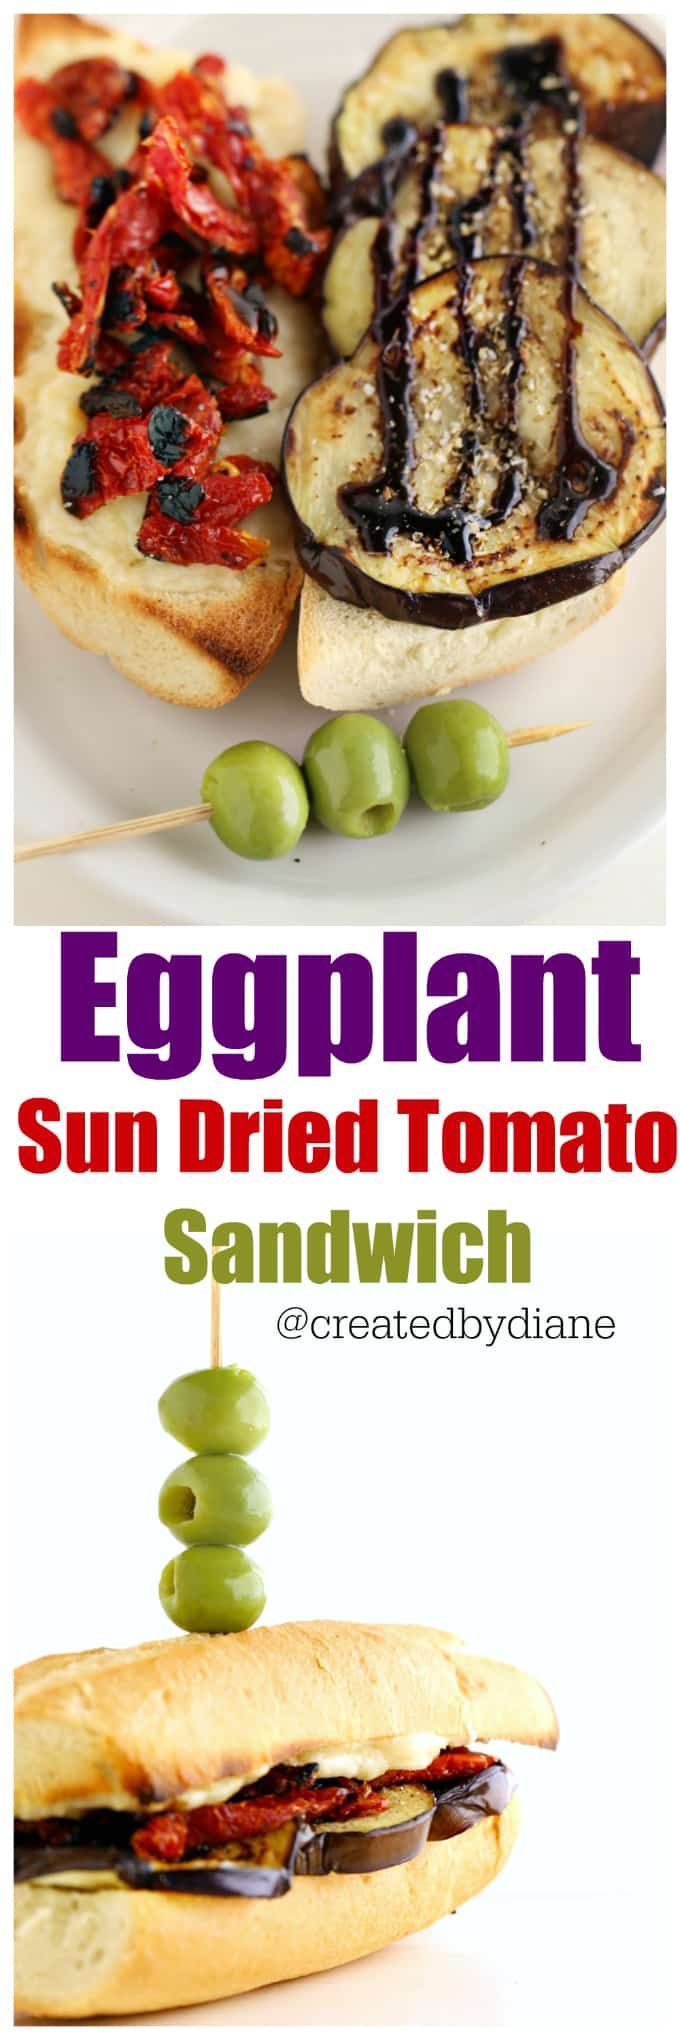 eggplant-sun-dried-tomato-sandwich-createdbydianeEdit description